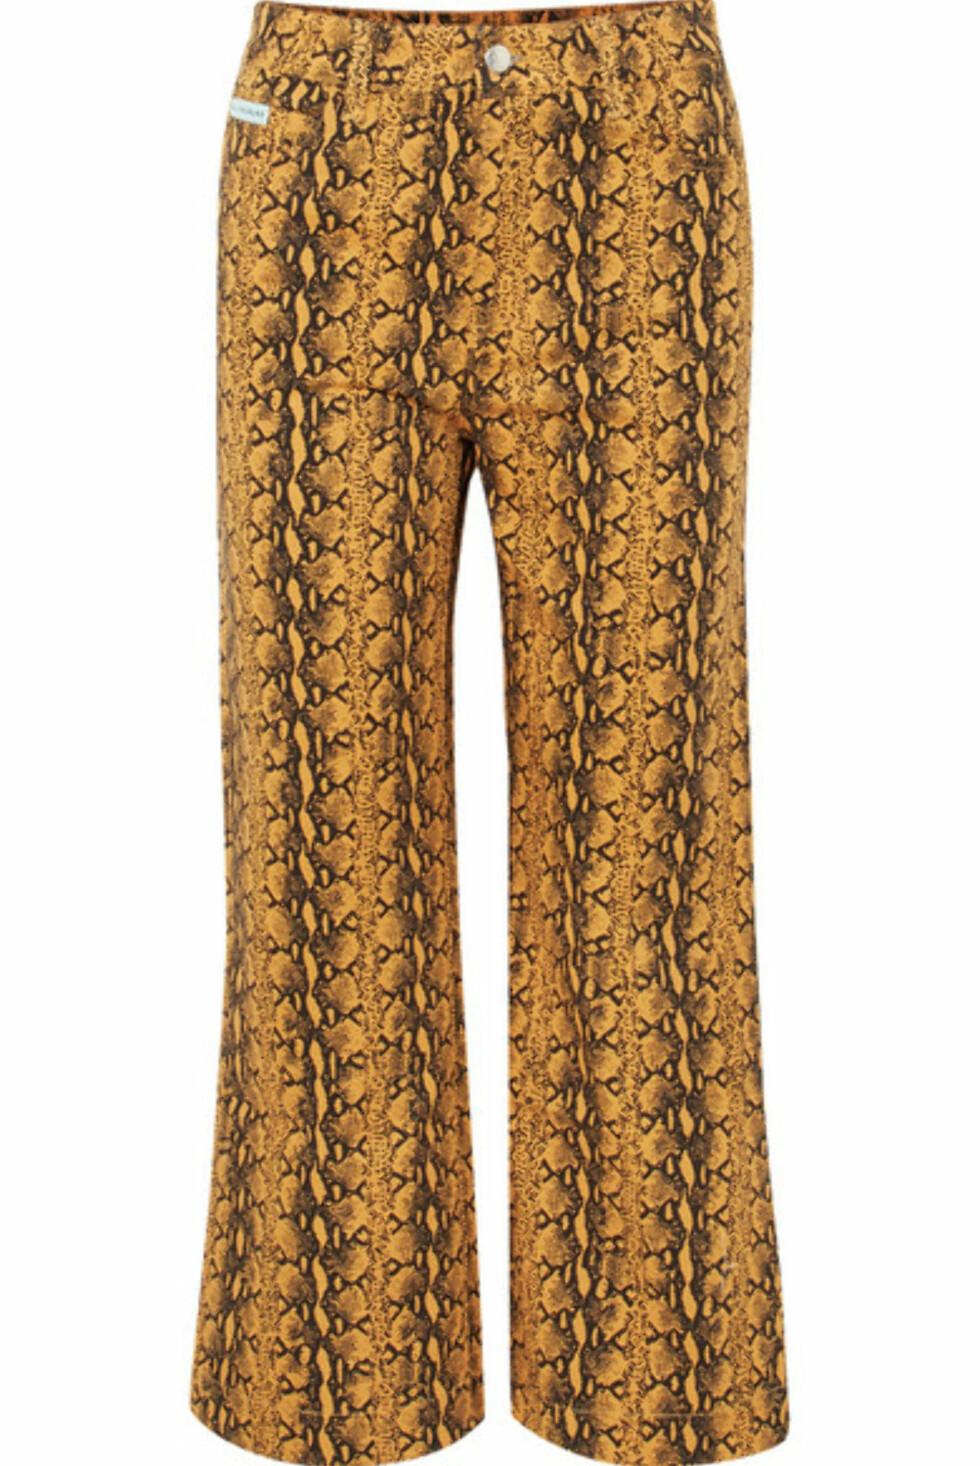 Bukse fra Alexa Chung  2700,-  https://www.net-a-porter.com/no/en/product/1062602/alexachung/cropped-snake-print-high-rise-wide-leg-jeans